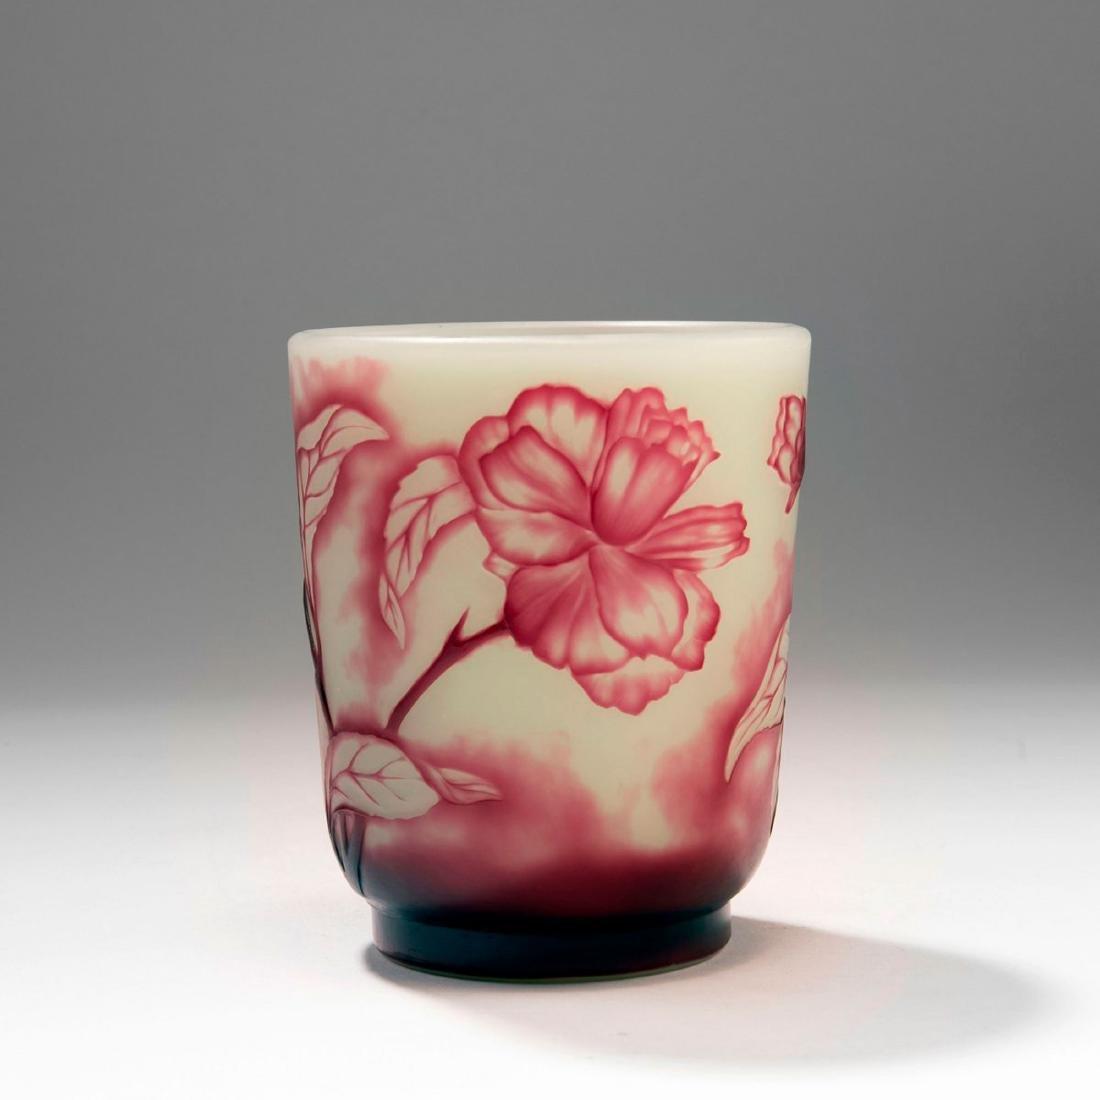 'Roses' vase, 1900-10 - 2